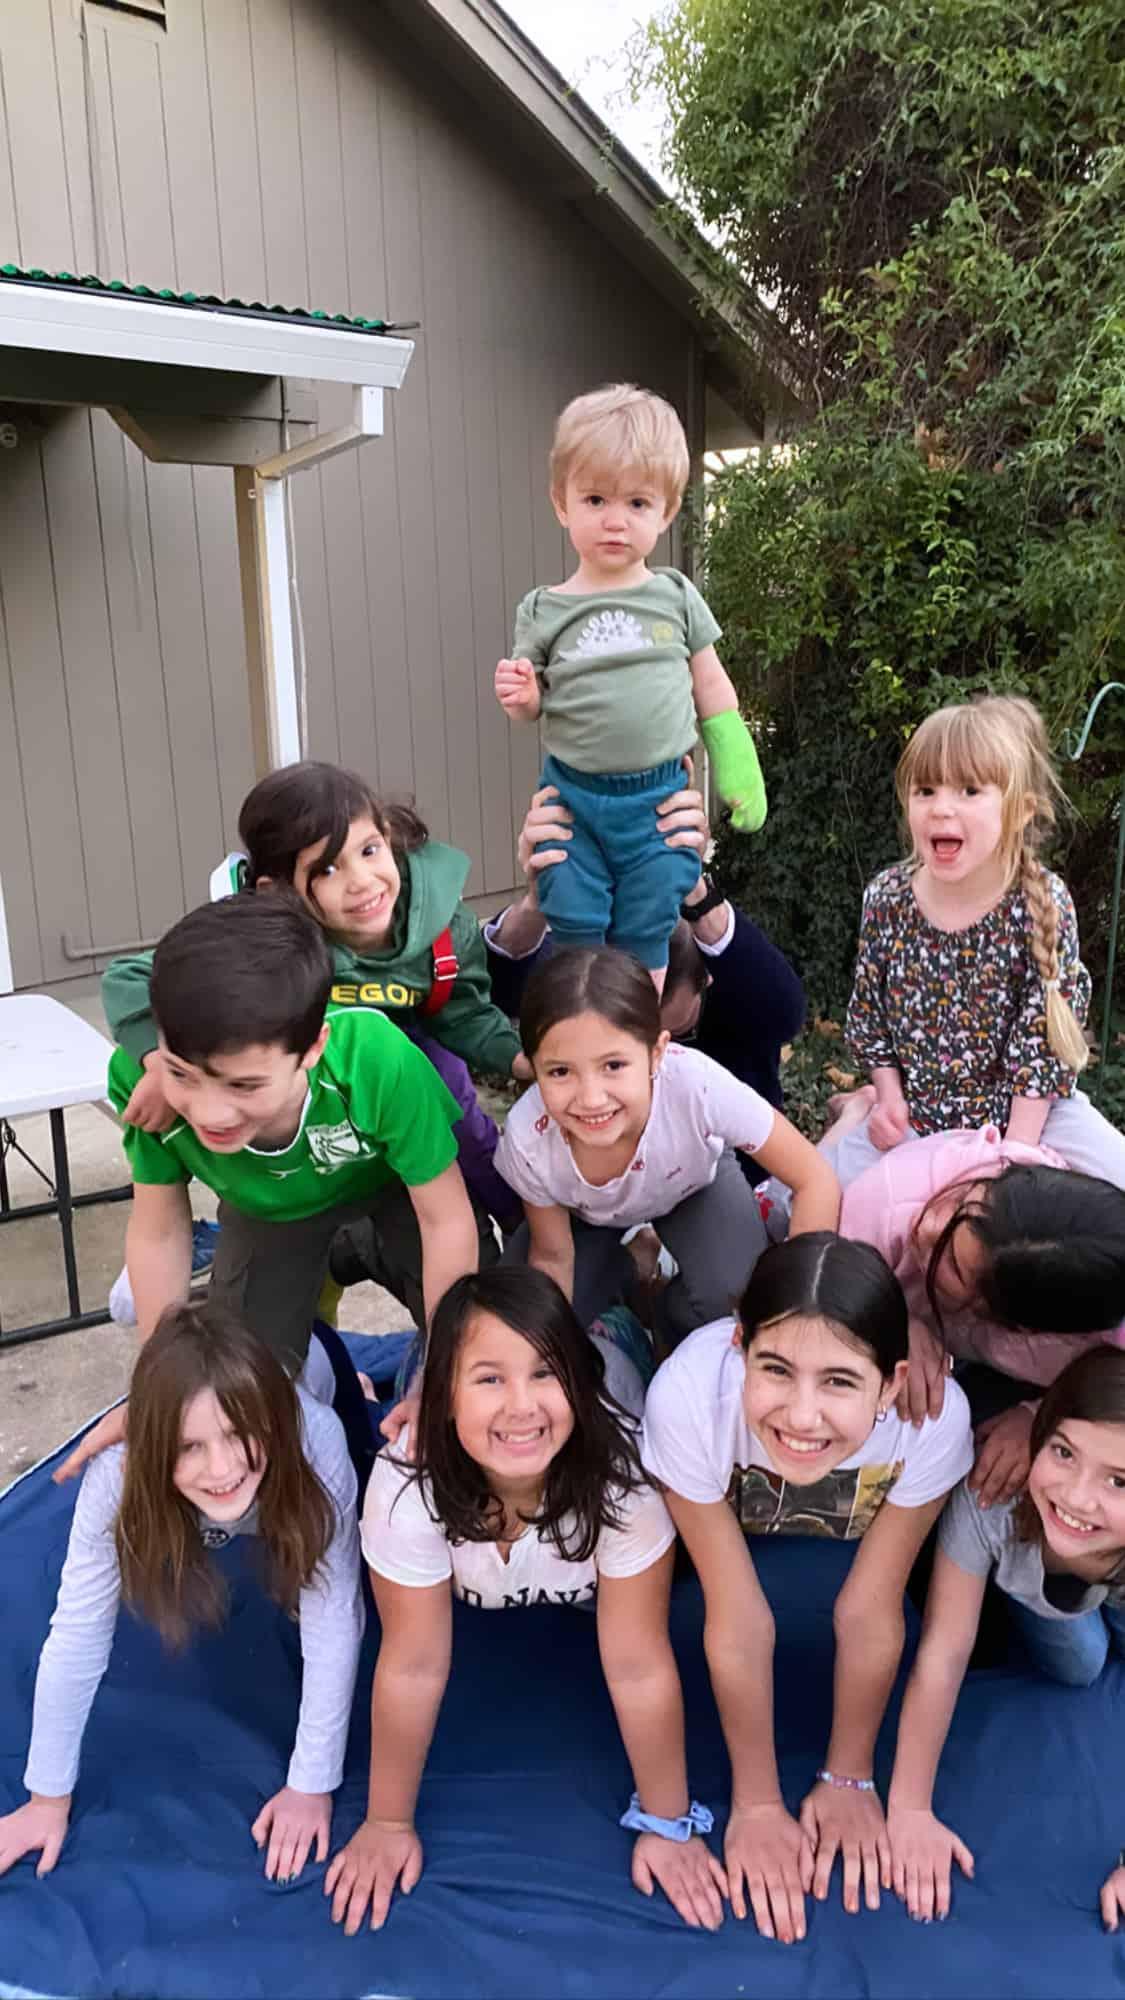 kids making a human pyramid